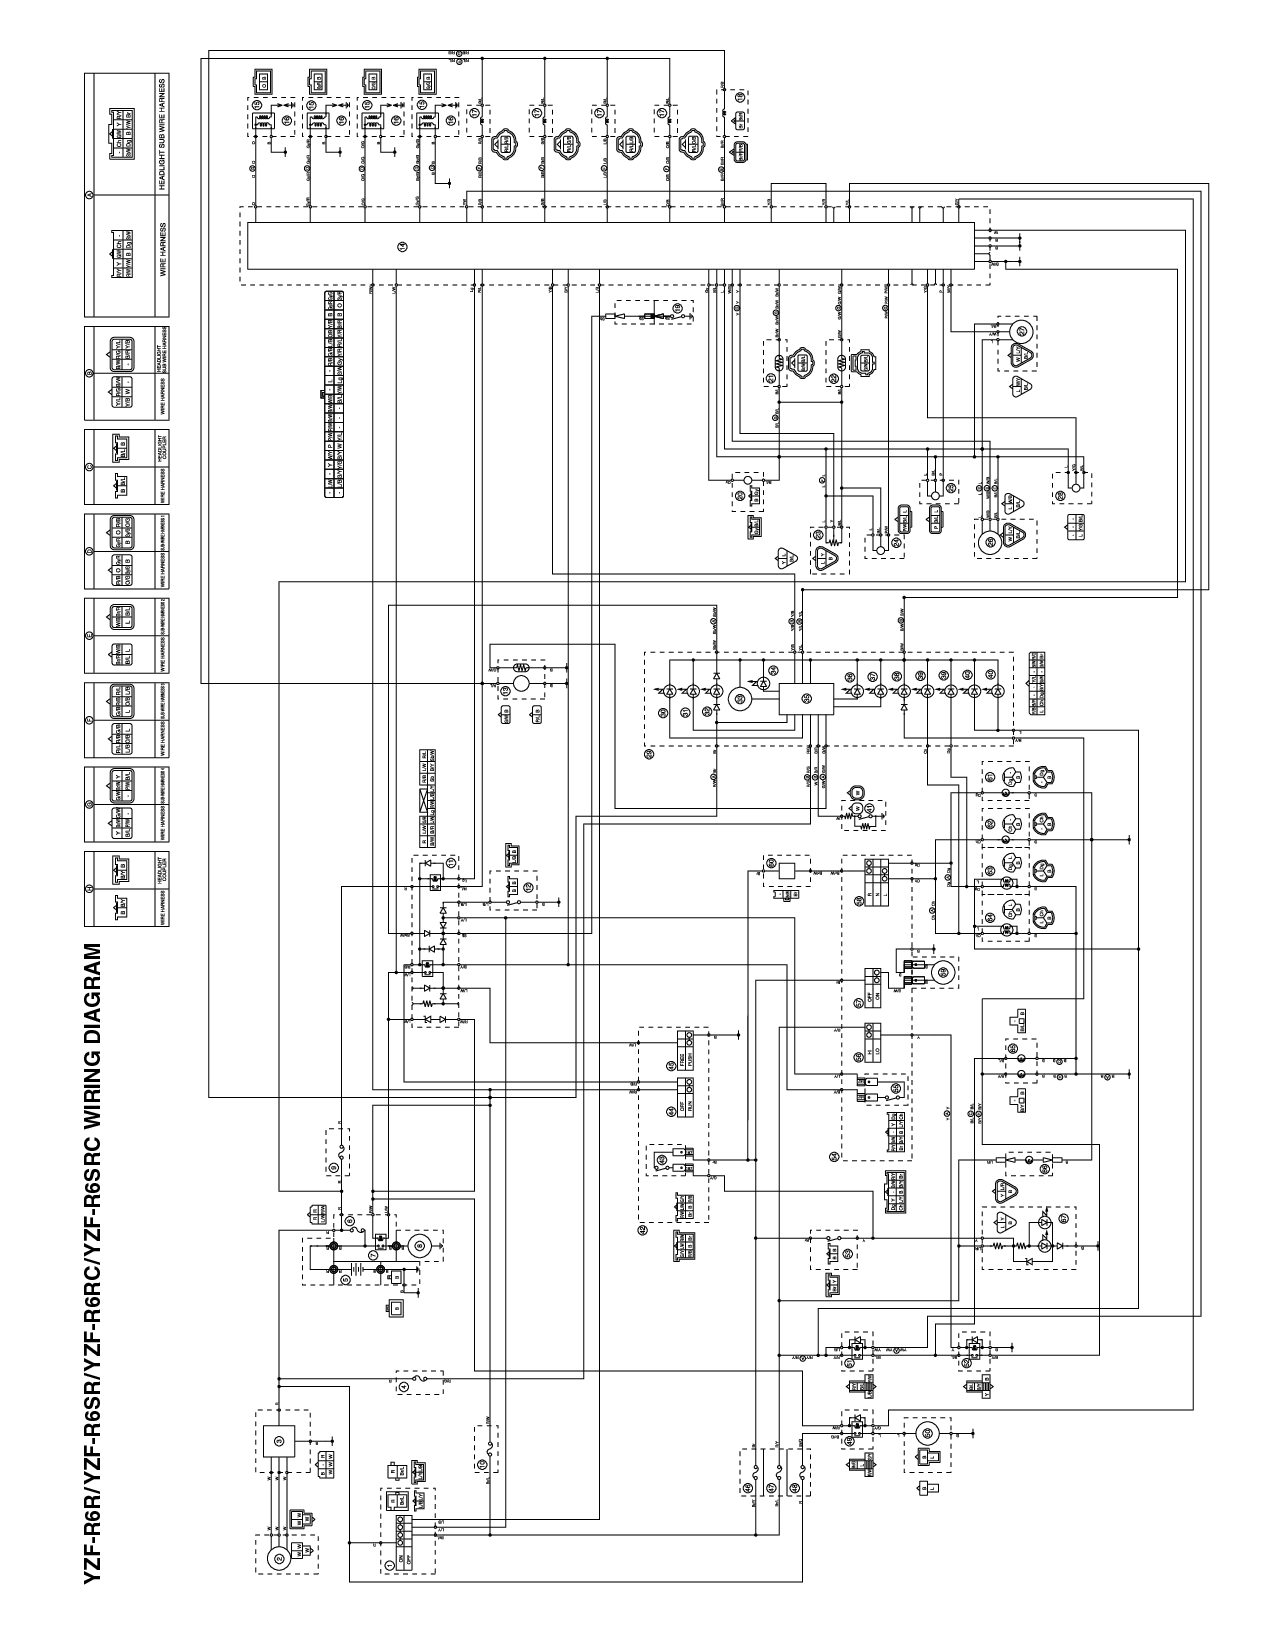 ON_1035] 2005 Yamaha Yzf R6 Wiring Diagram Download DiagramUnho Obenz Aspi Hist Monoc Eumqu Olyti Kapemie Mohammedshrine Librar Wiring  101